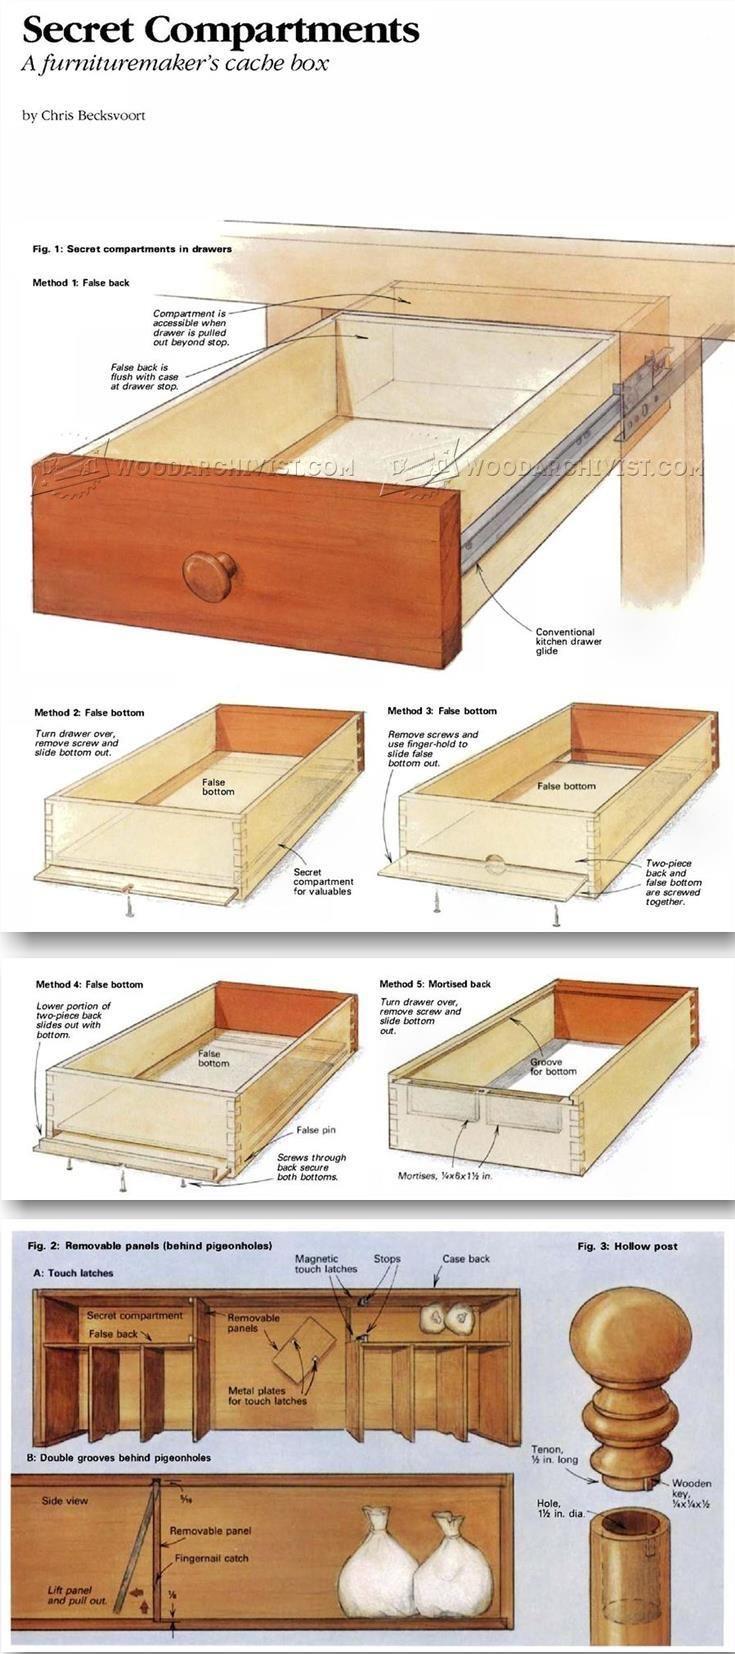 Furniture Secret Compartments - Furniture Plans and Projects | WoodArchivist.com